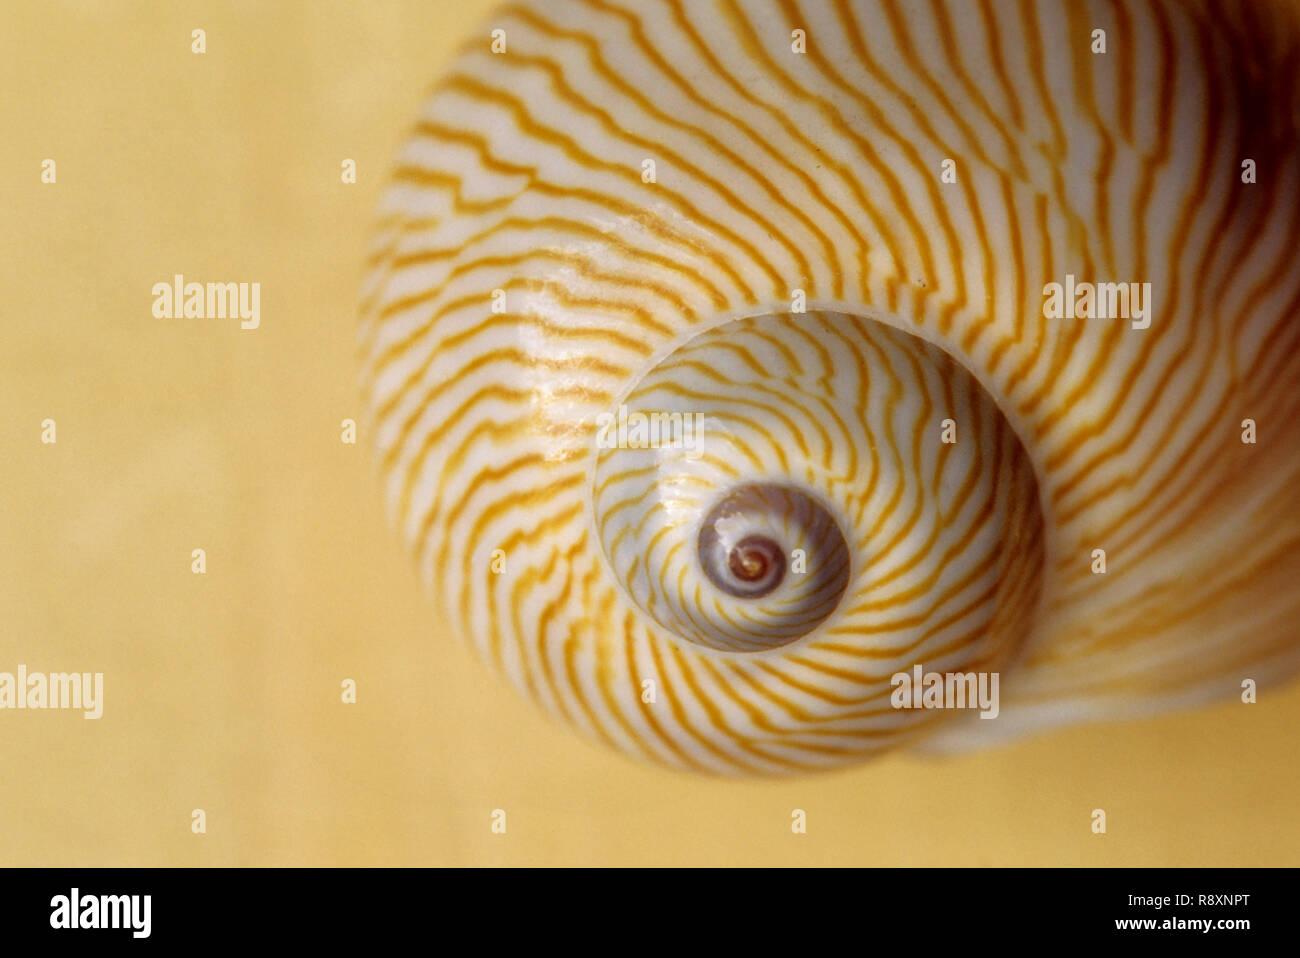 Primeros planos de shell, concepto, india Imagen De Stock